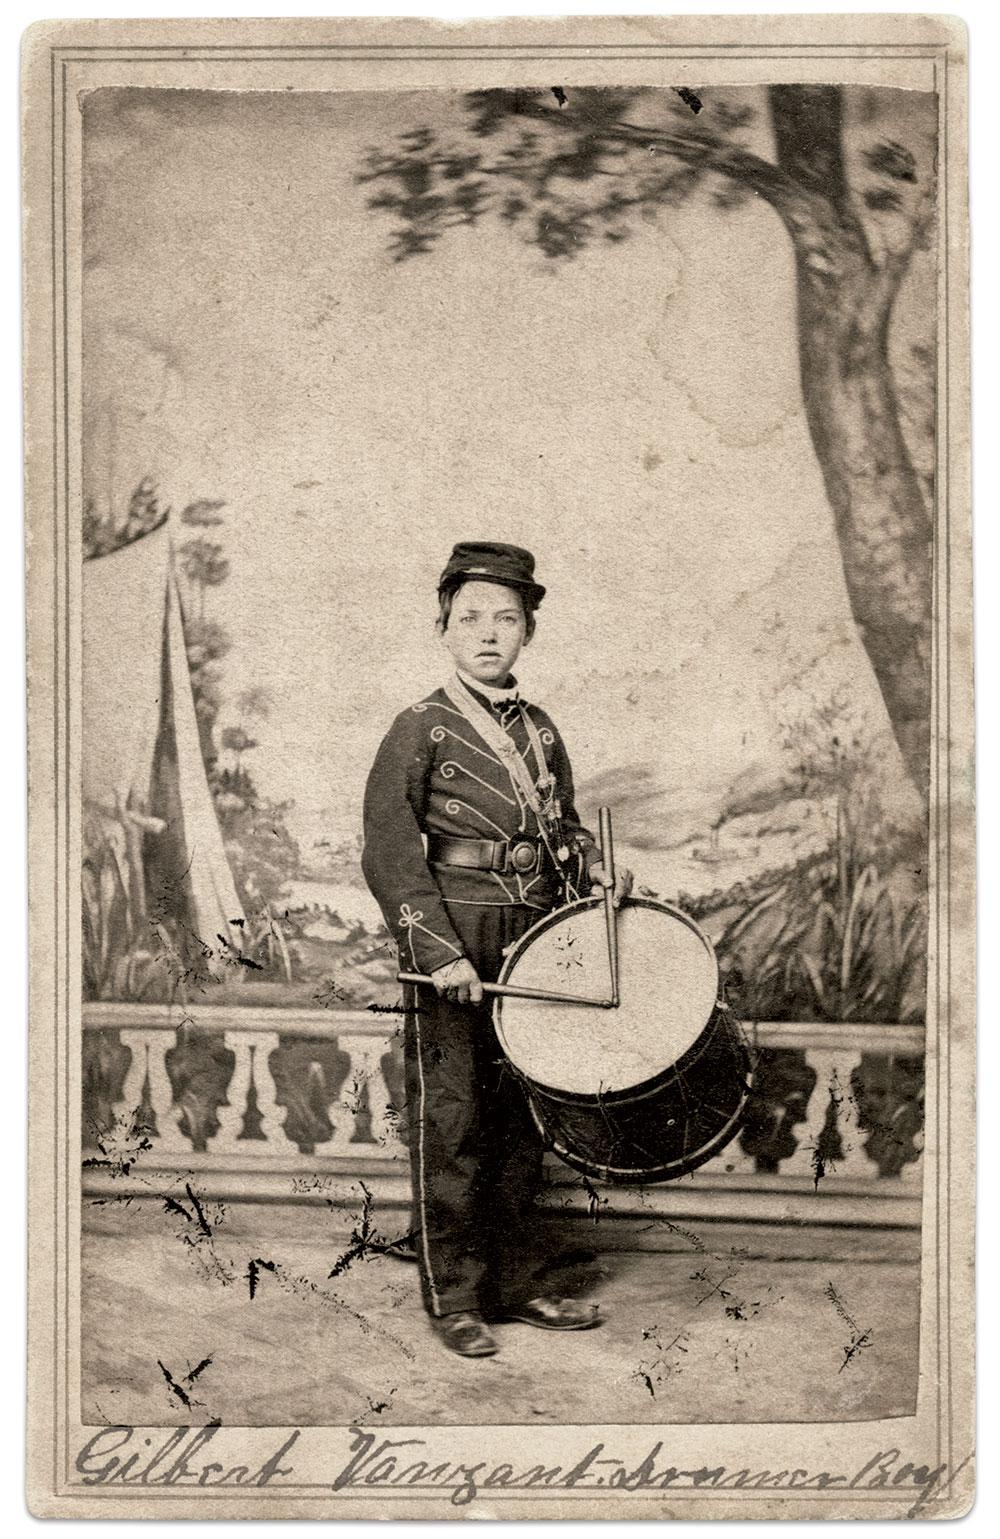 Carte de visite by Joseph H. Van Stavoren of Nashville, Tenn. Rick Carlile Collection.